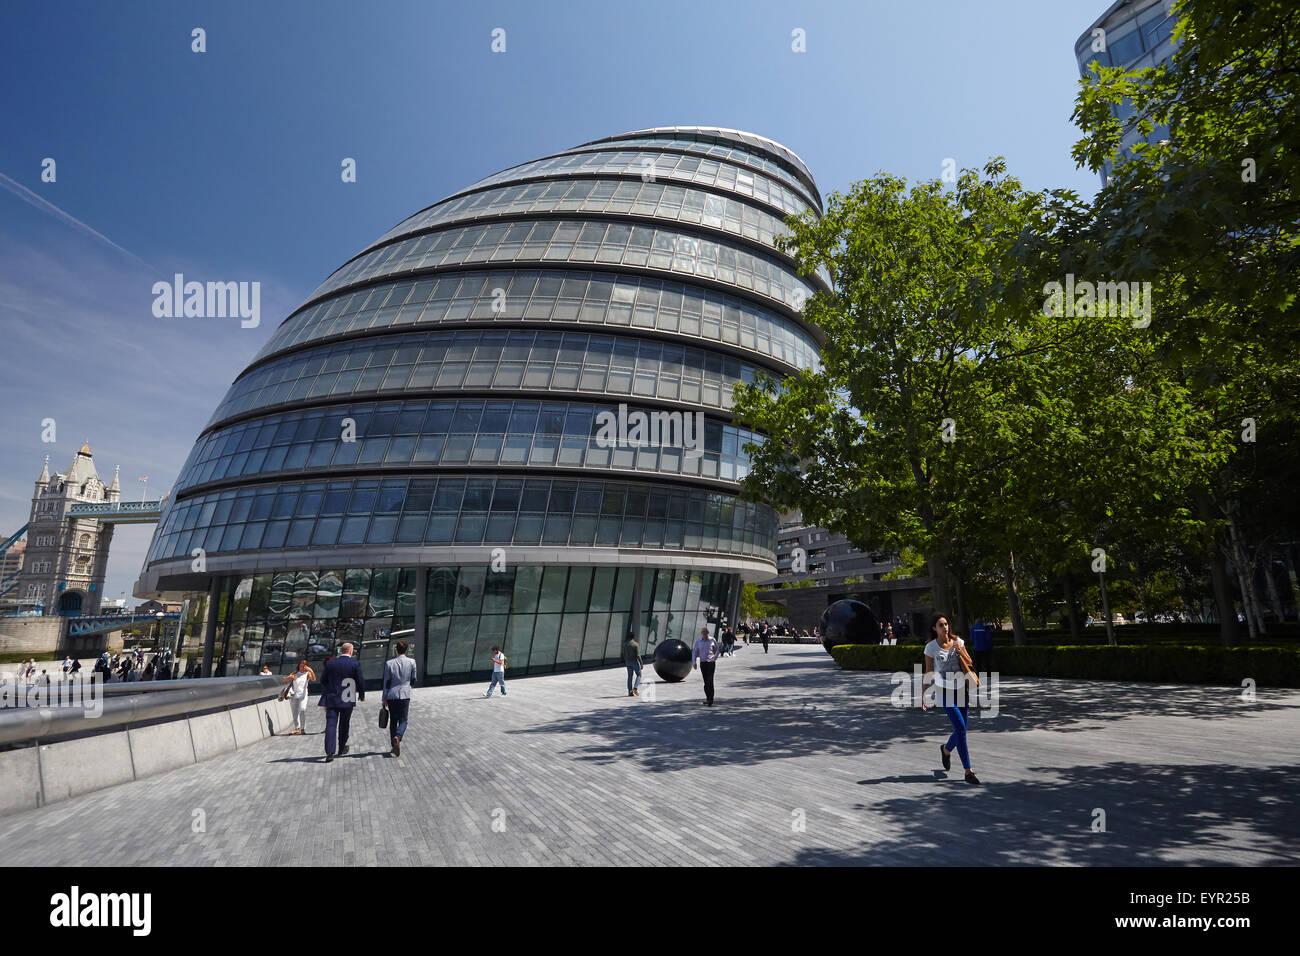 London City Hall - Stock Image